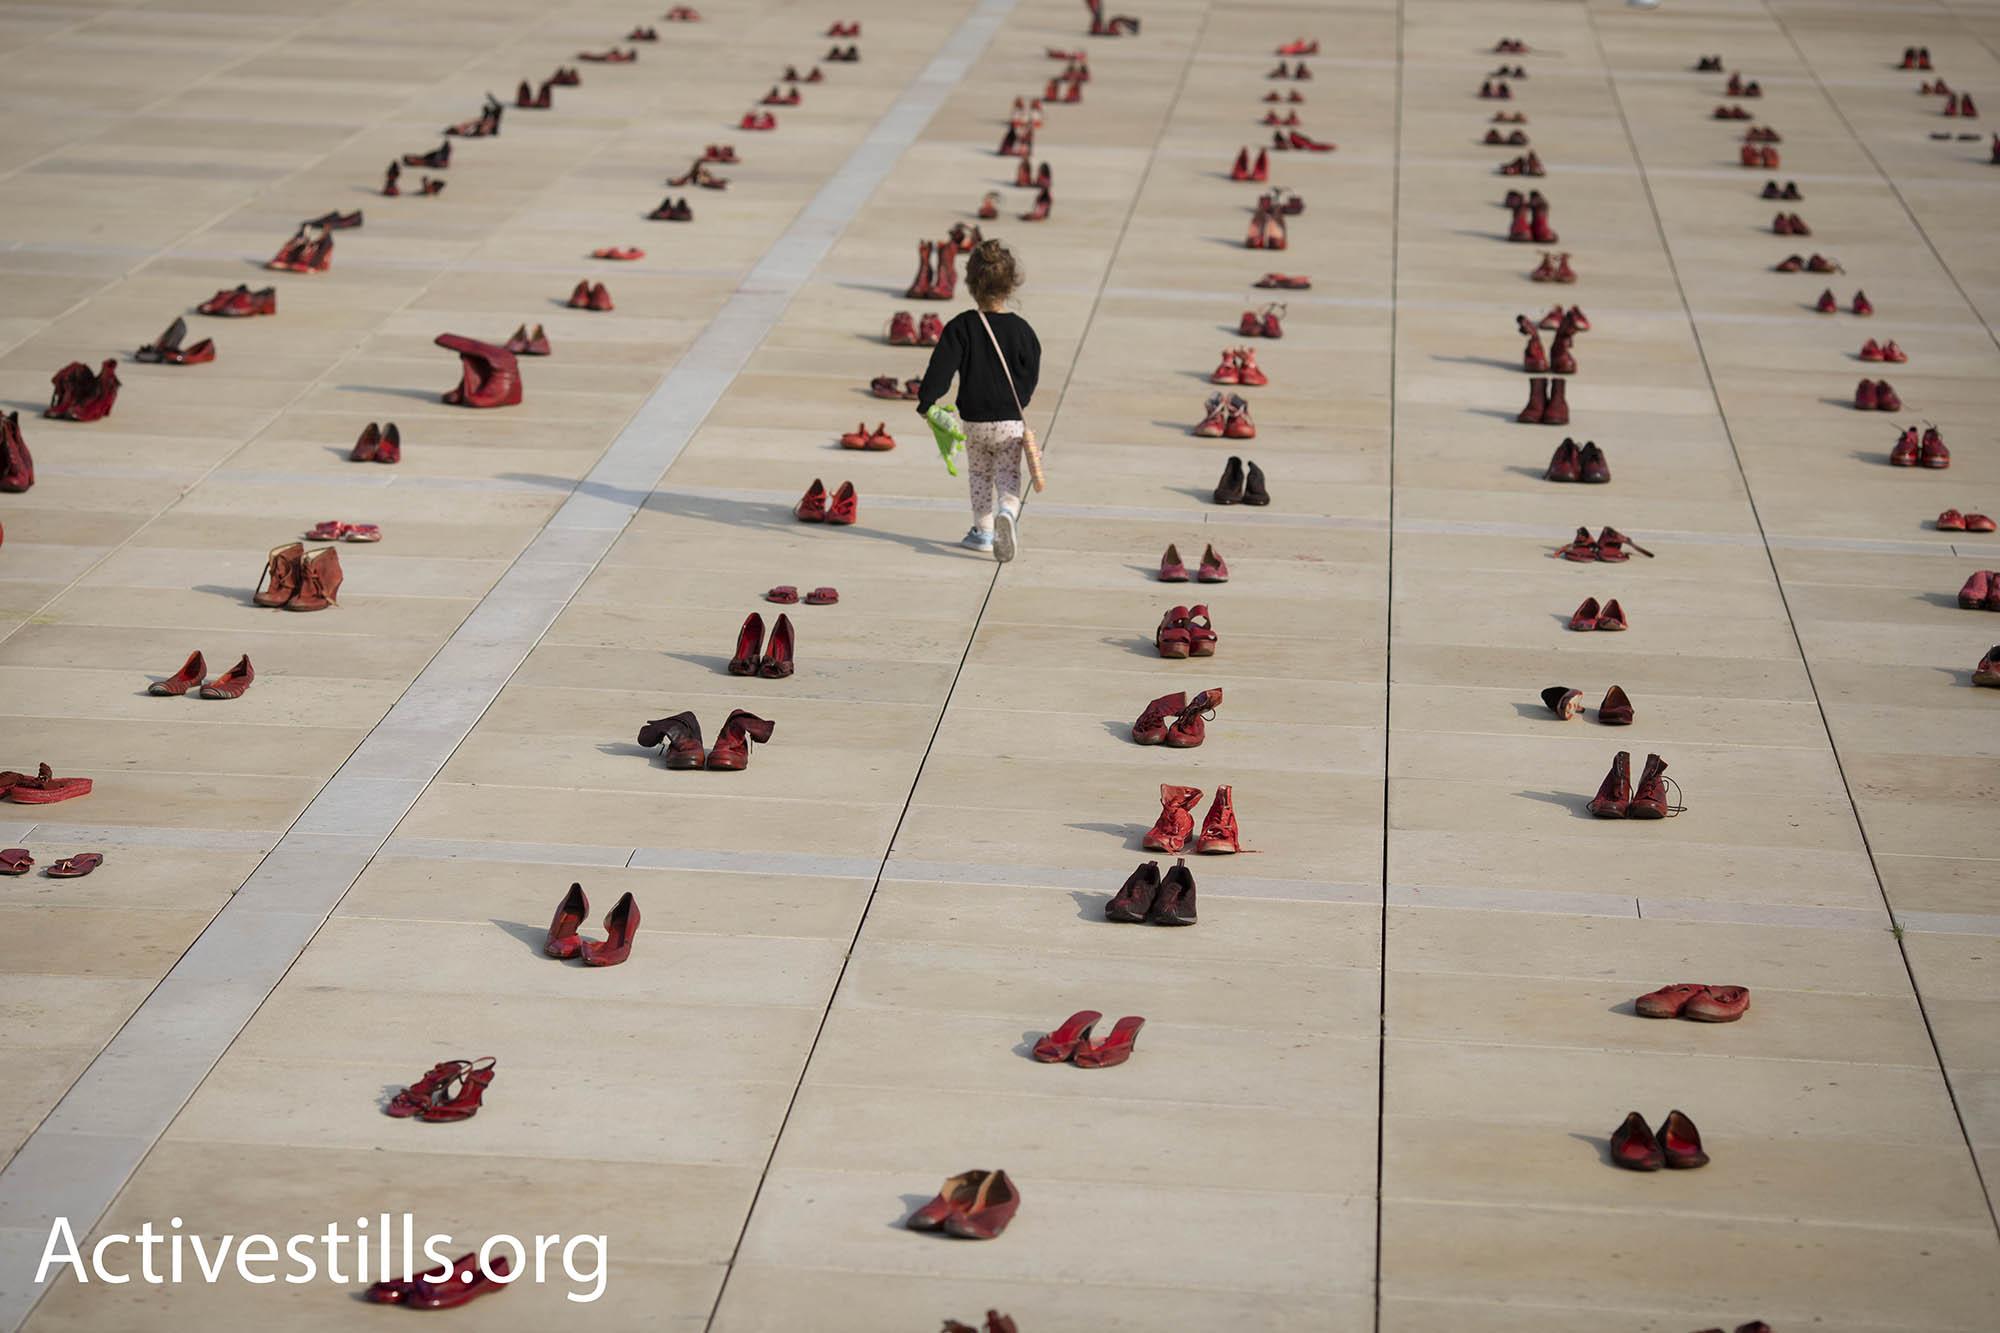 Feminist activists paint hundreds of pairs of shoes red to protest gender violence, Tel Aviv, December 4, 2018. (Oren Ziv/Activestills.org)